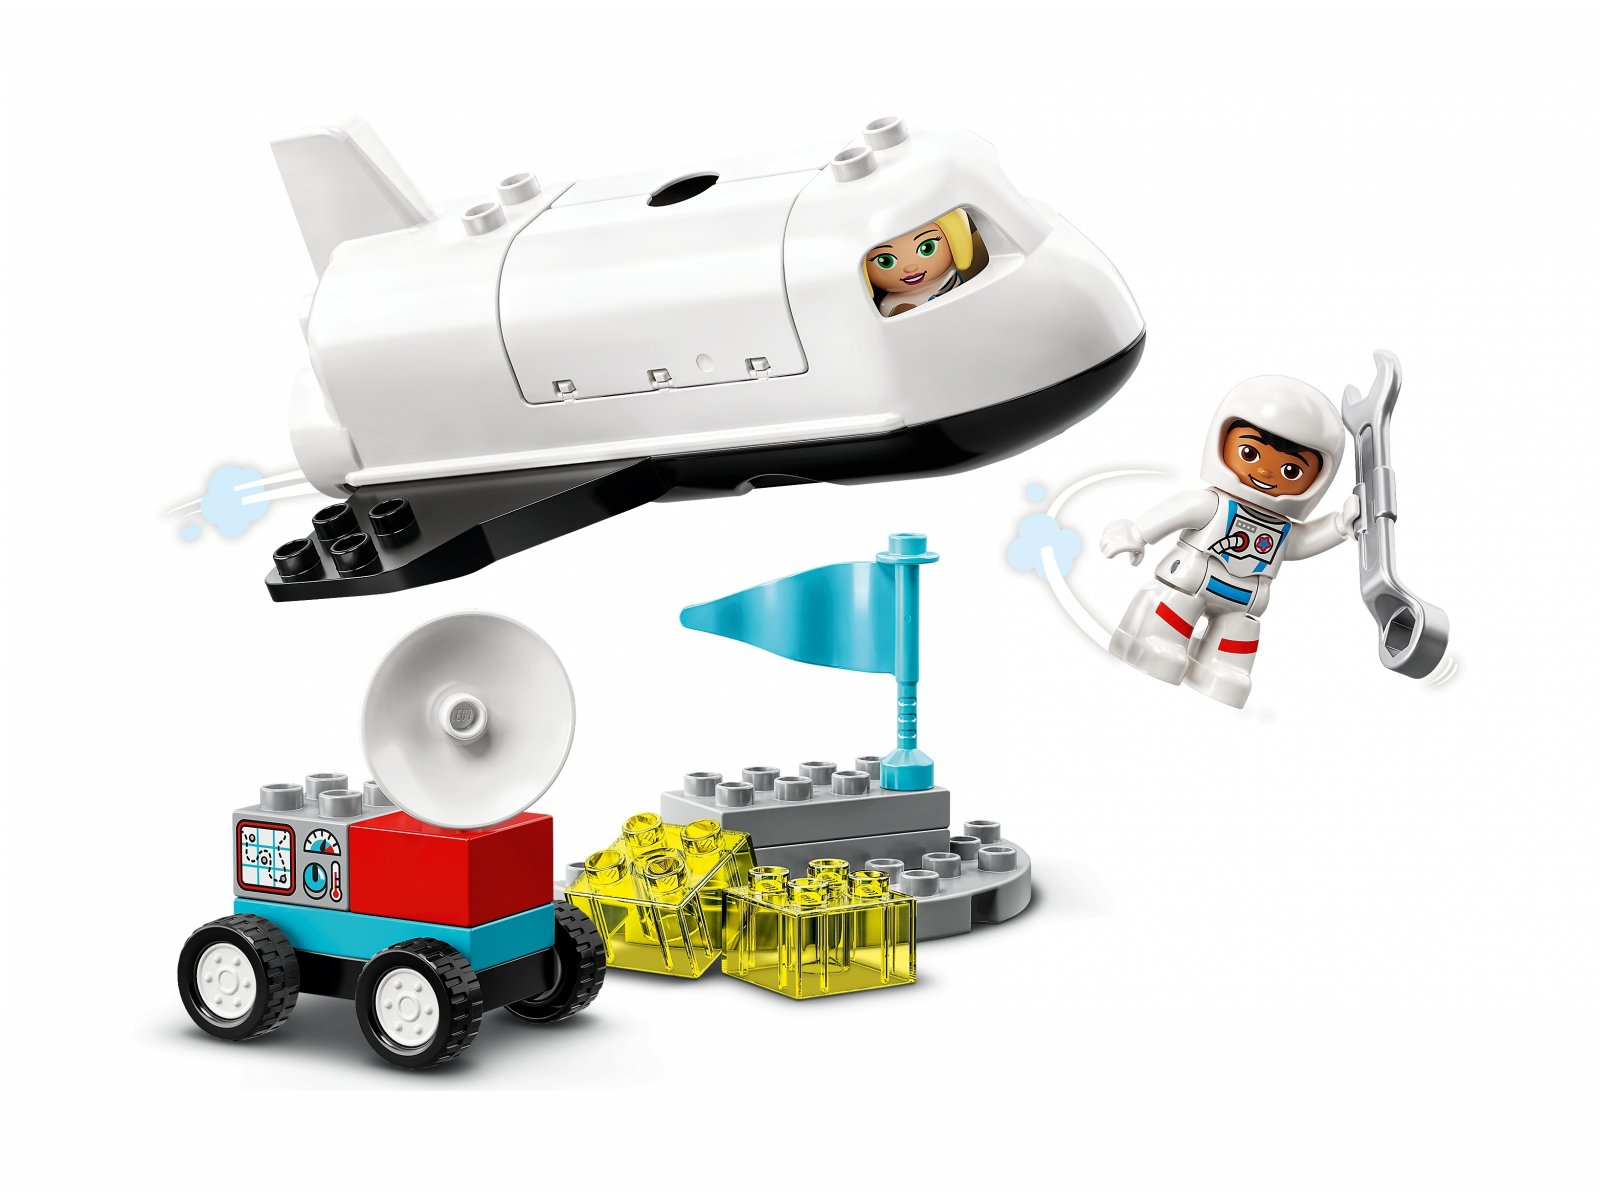 LEGO Duplo Lot promem kosmicznym 10944